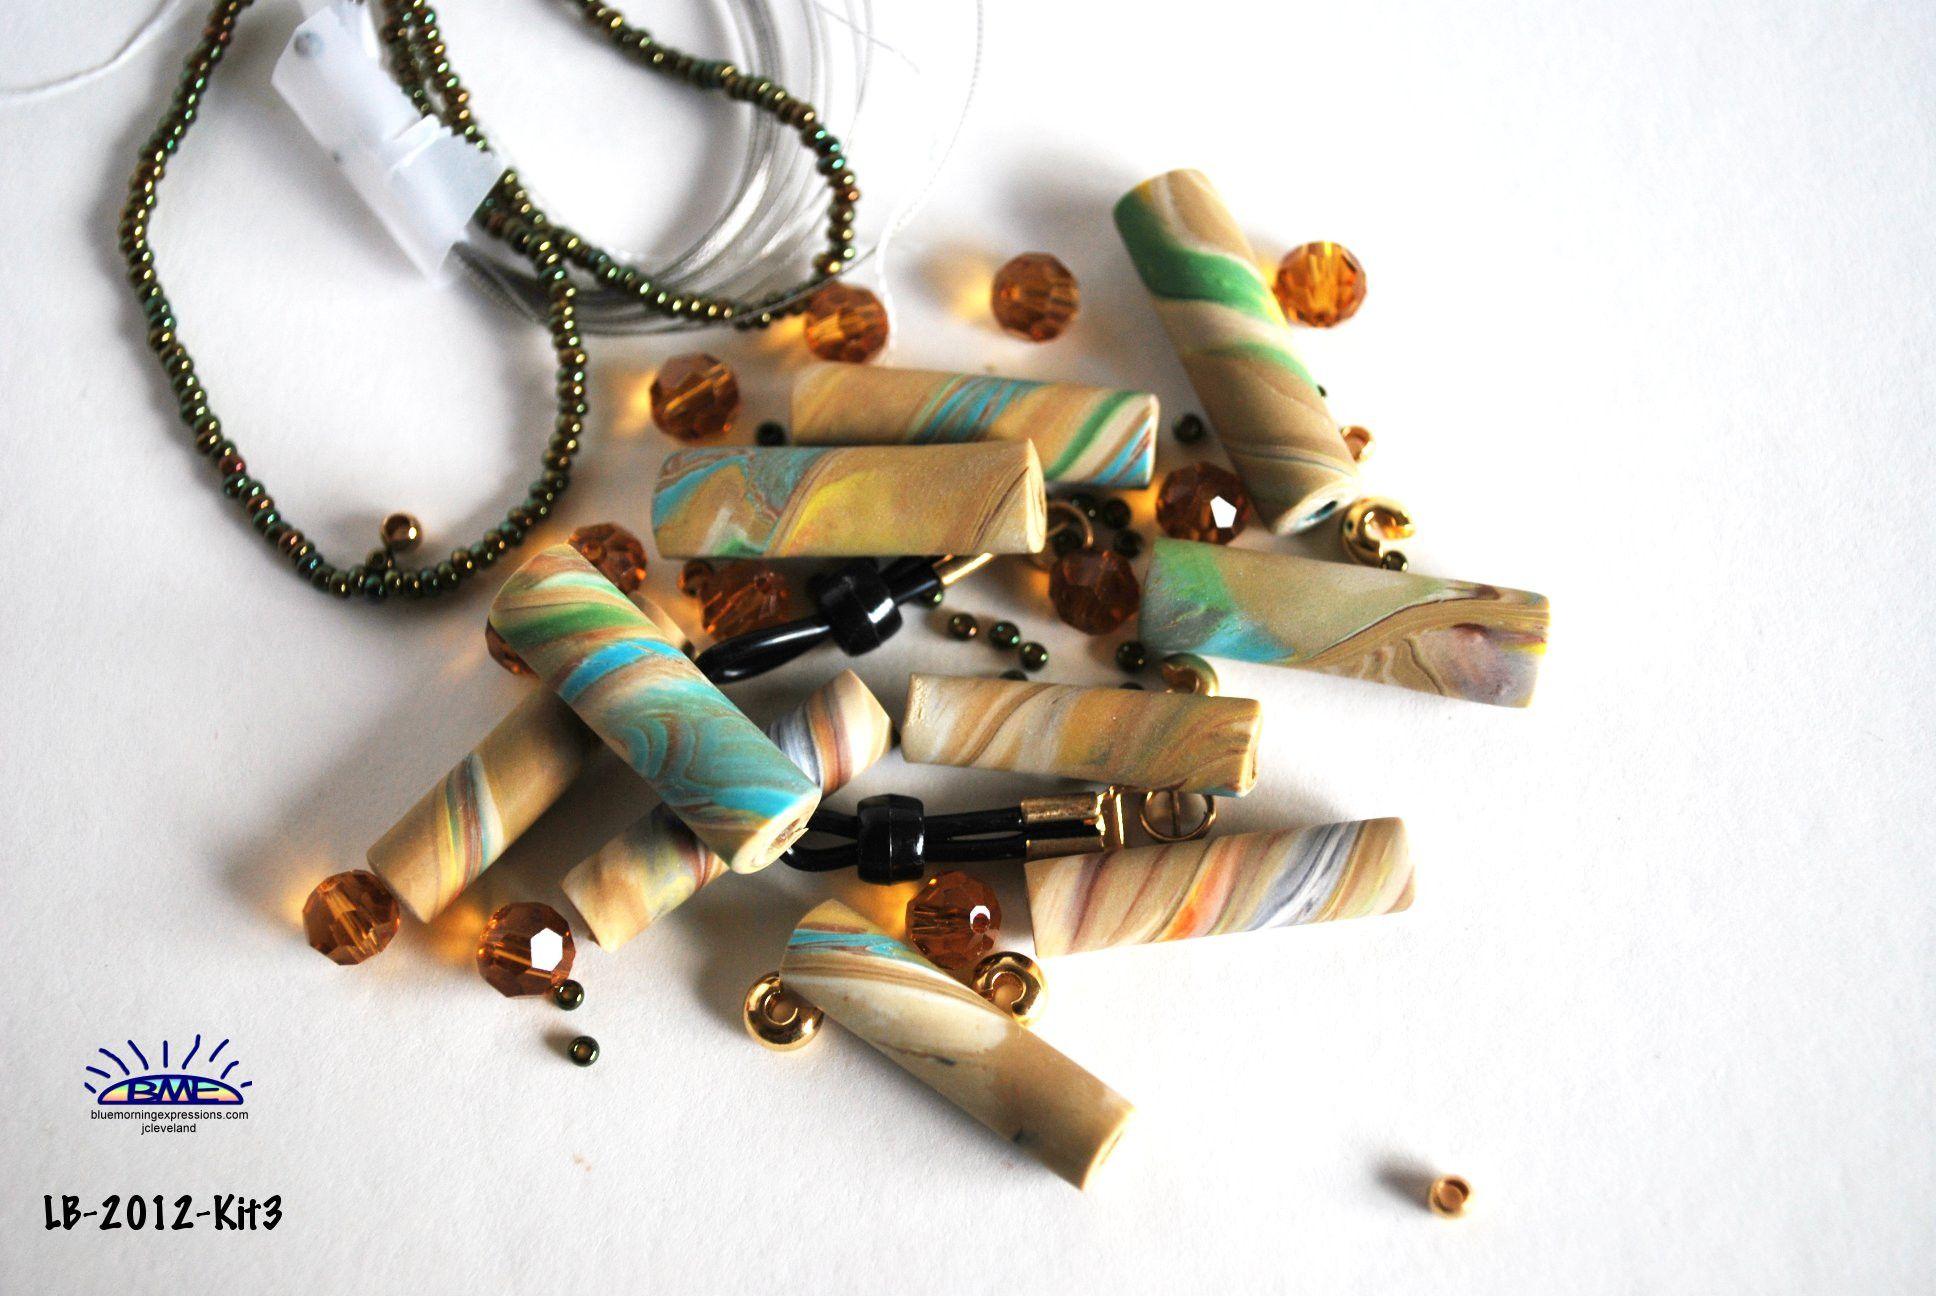 Handmade Polymer Clay #Beads , Polymer Clay, Jewelry Making Supplies, Bead Supplies, Bead Kit